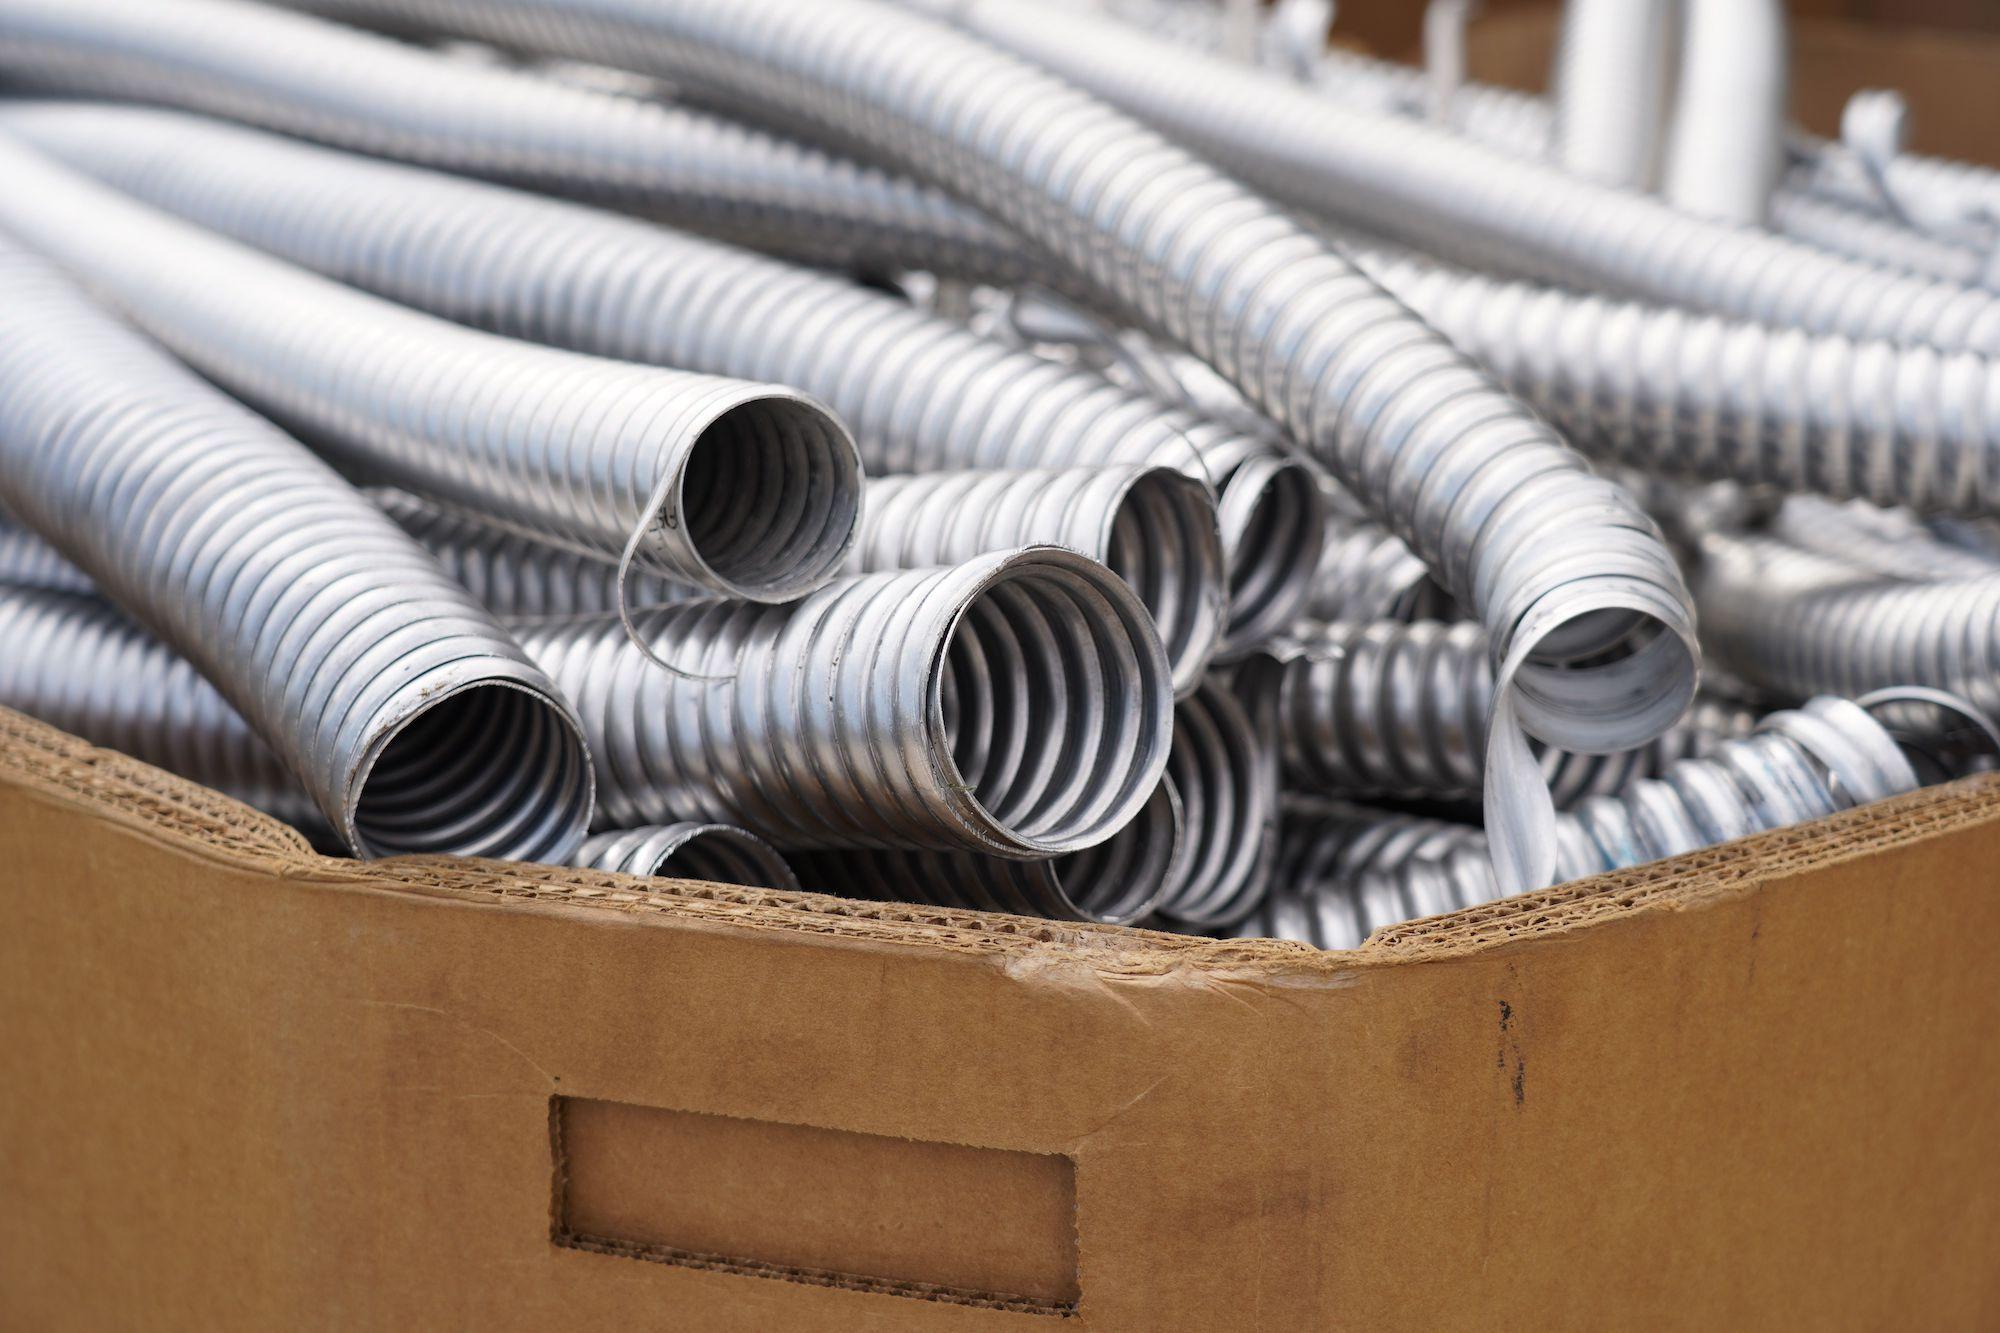 Why Use Scrap Metal Yards